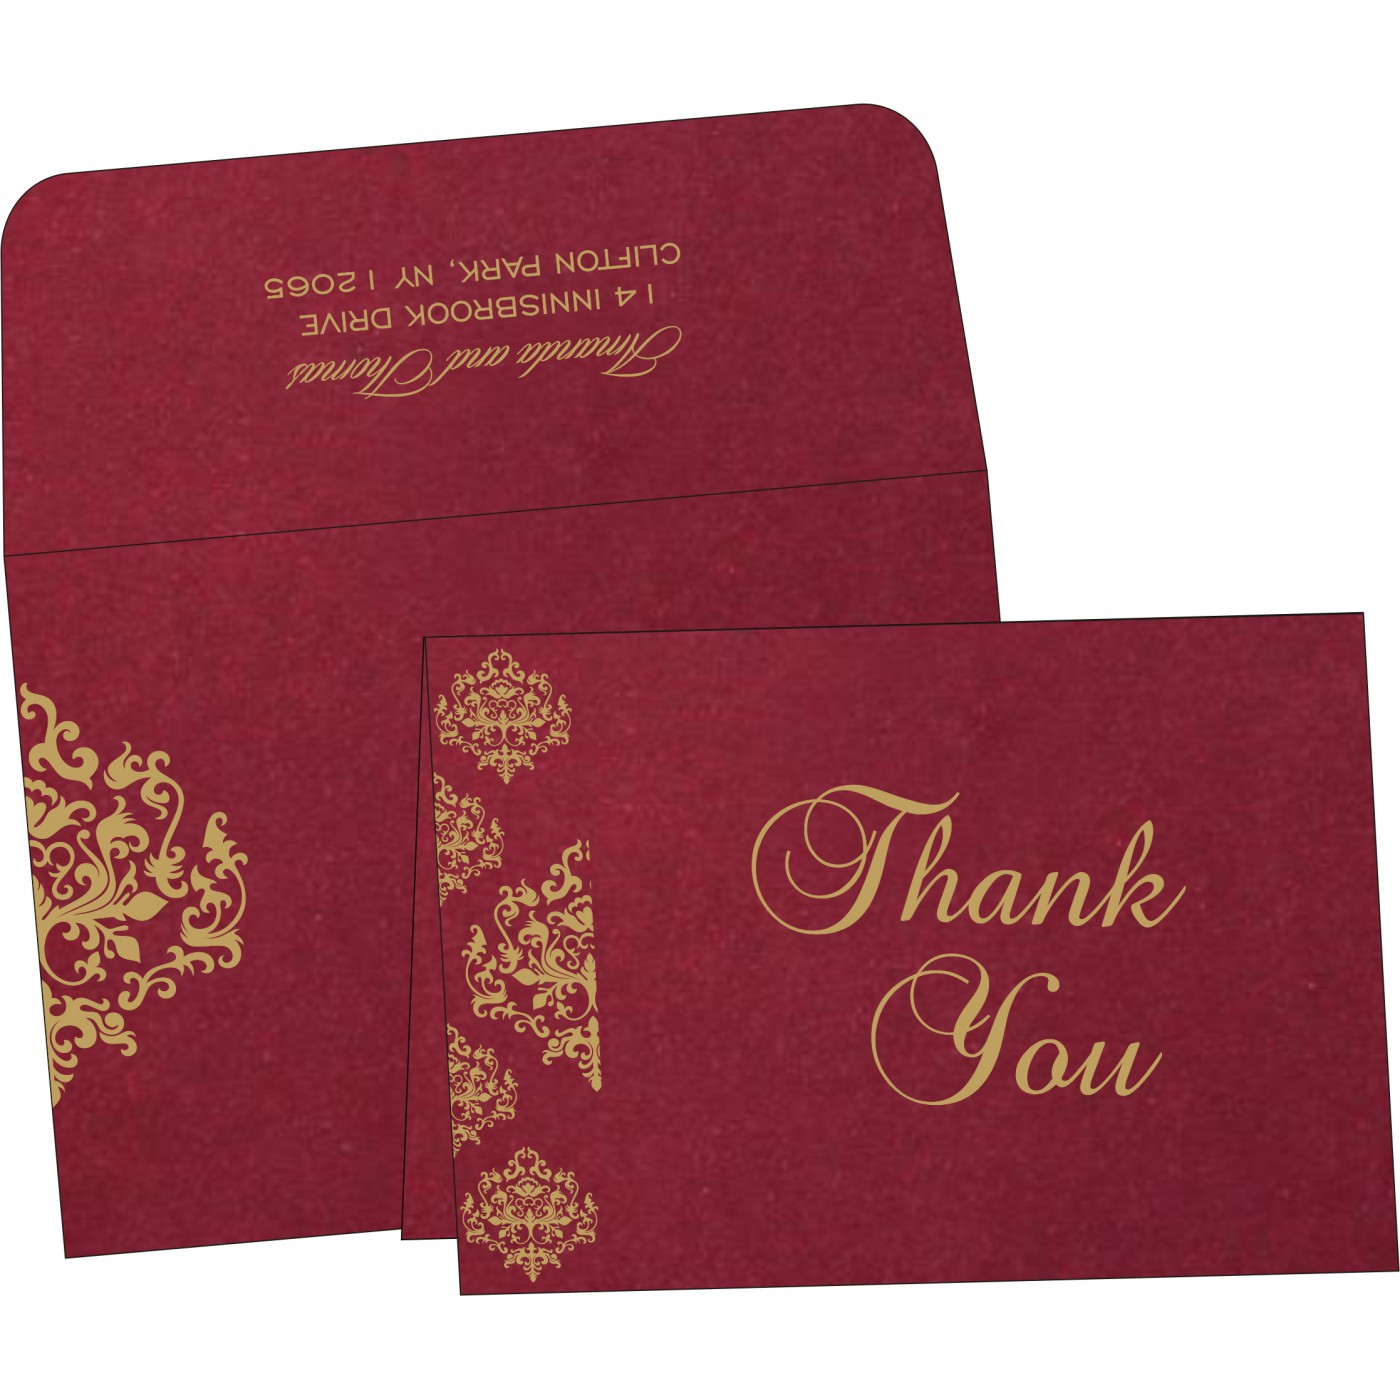 Thank You Cards : TYC-8254B - 123WeddingCards